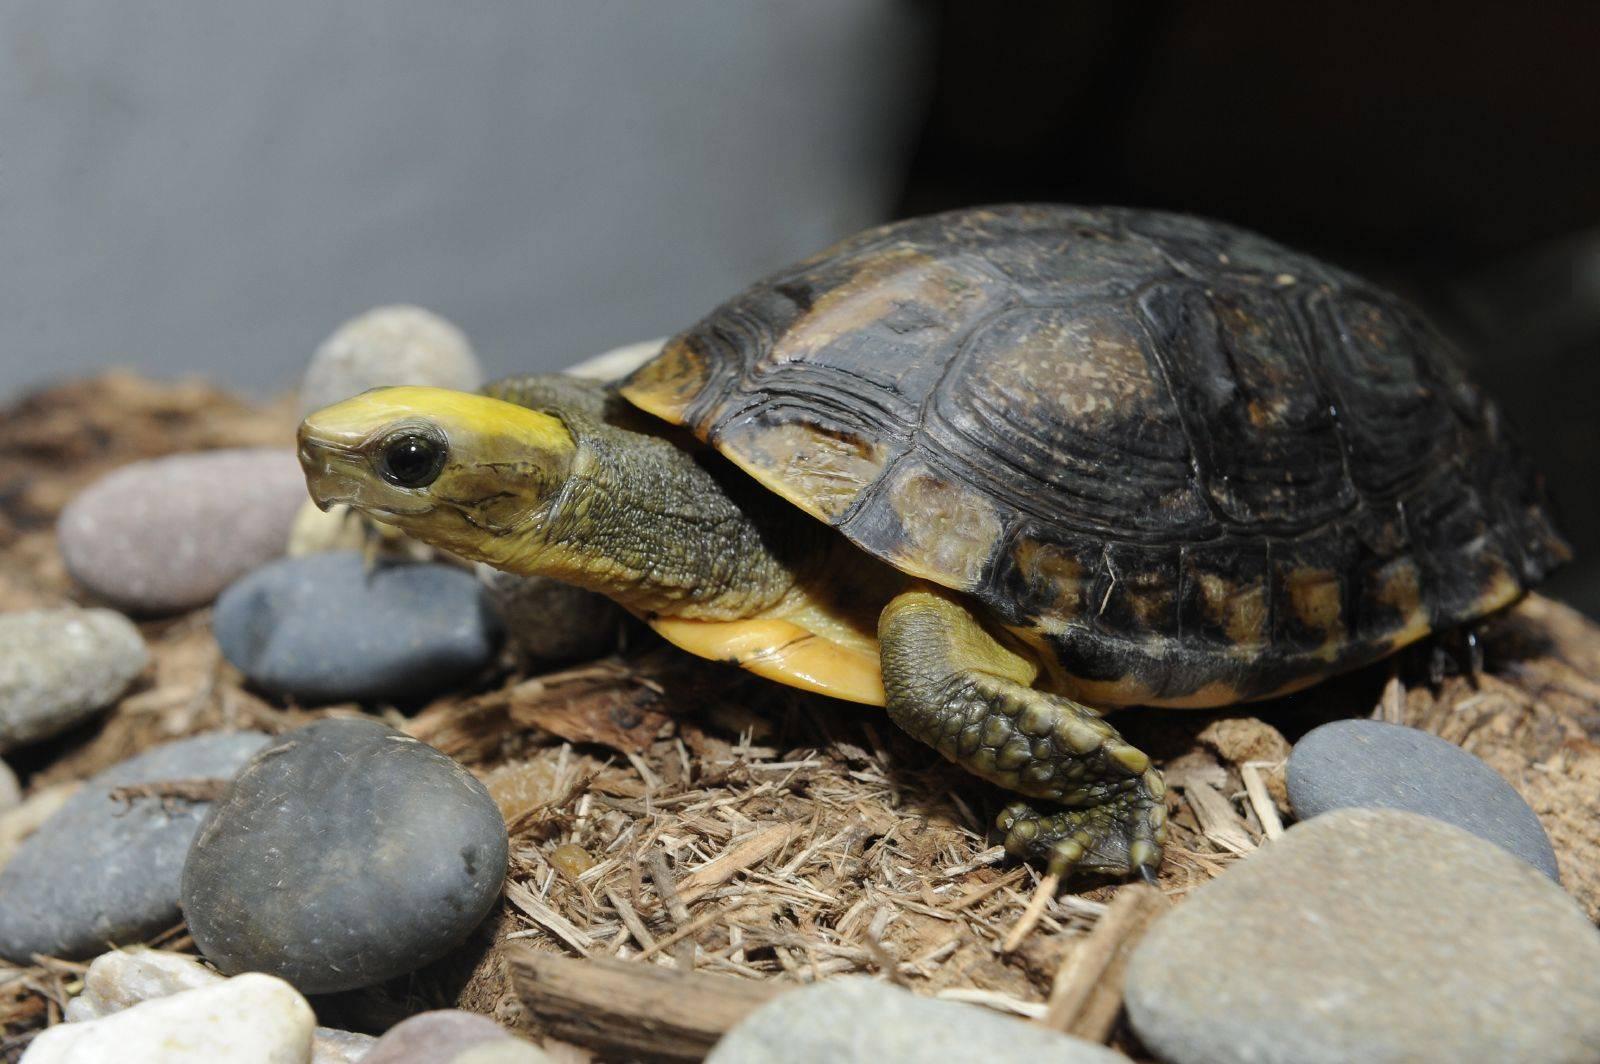 Оливковая черепаха – фото, описание, ареал, питание, размножение, враги